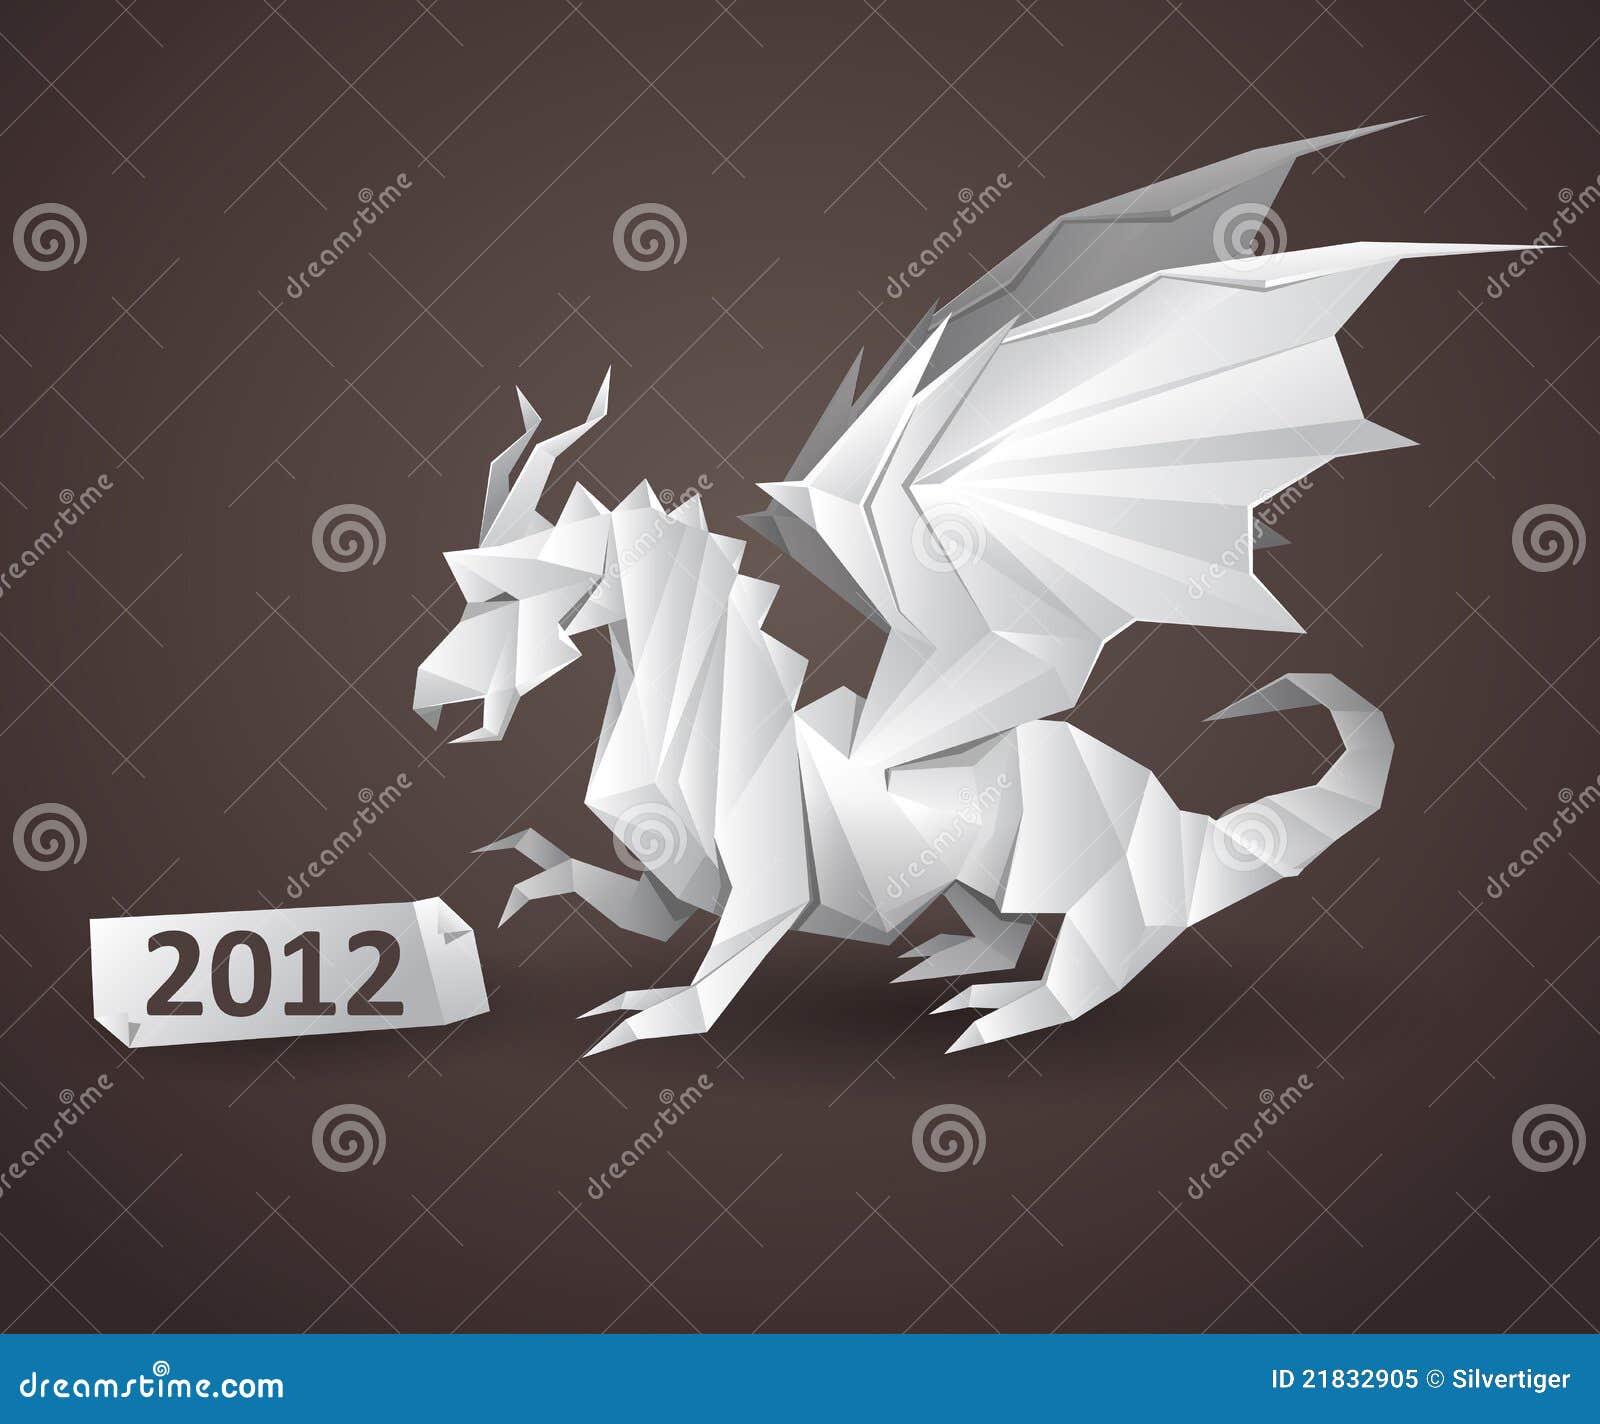 Dragon Origami Stock Vector Illustration Of Greeting 21832905